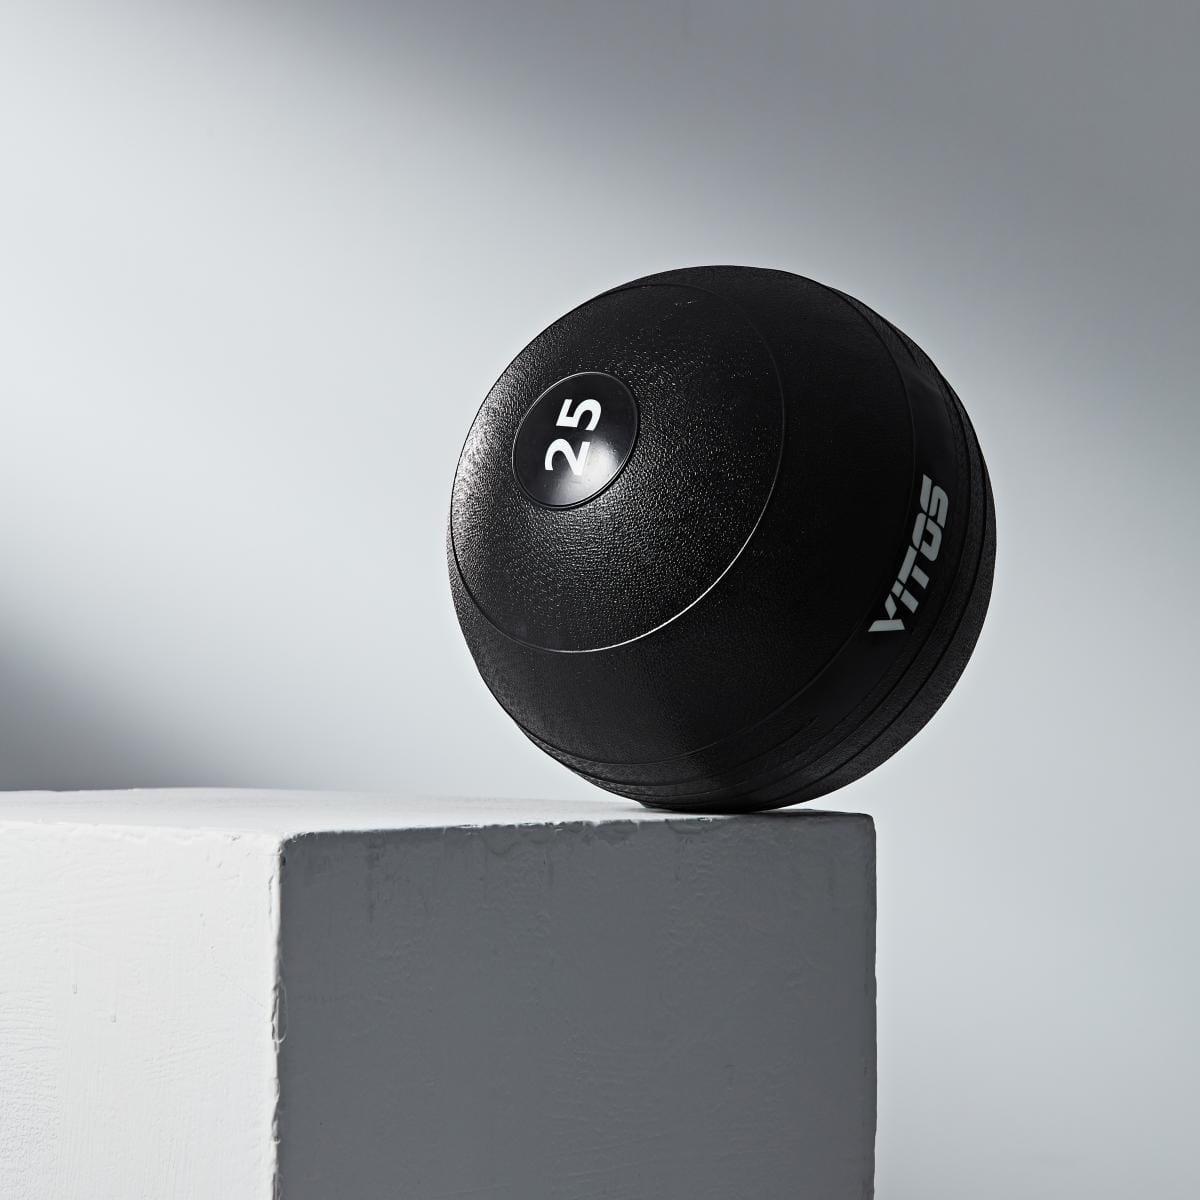 VITOS 重力球 45磅 20公斤 3